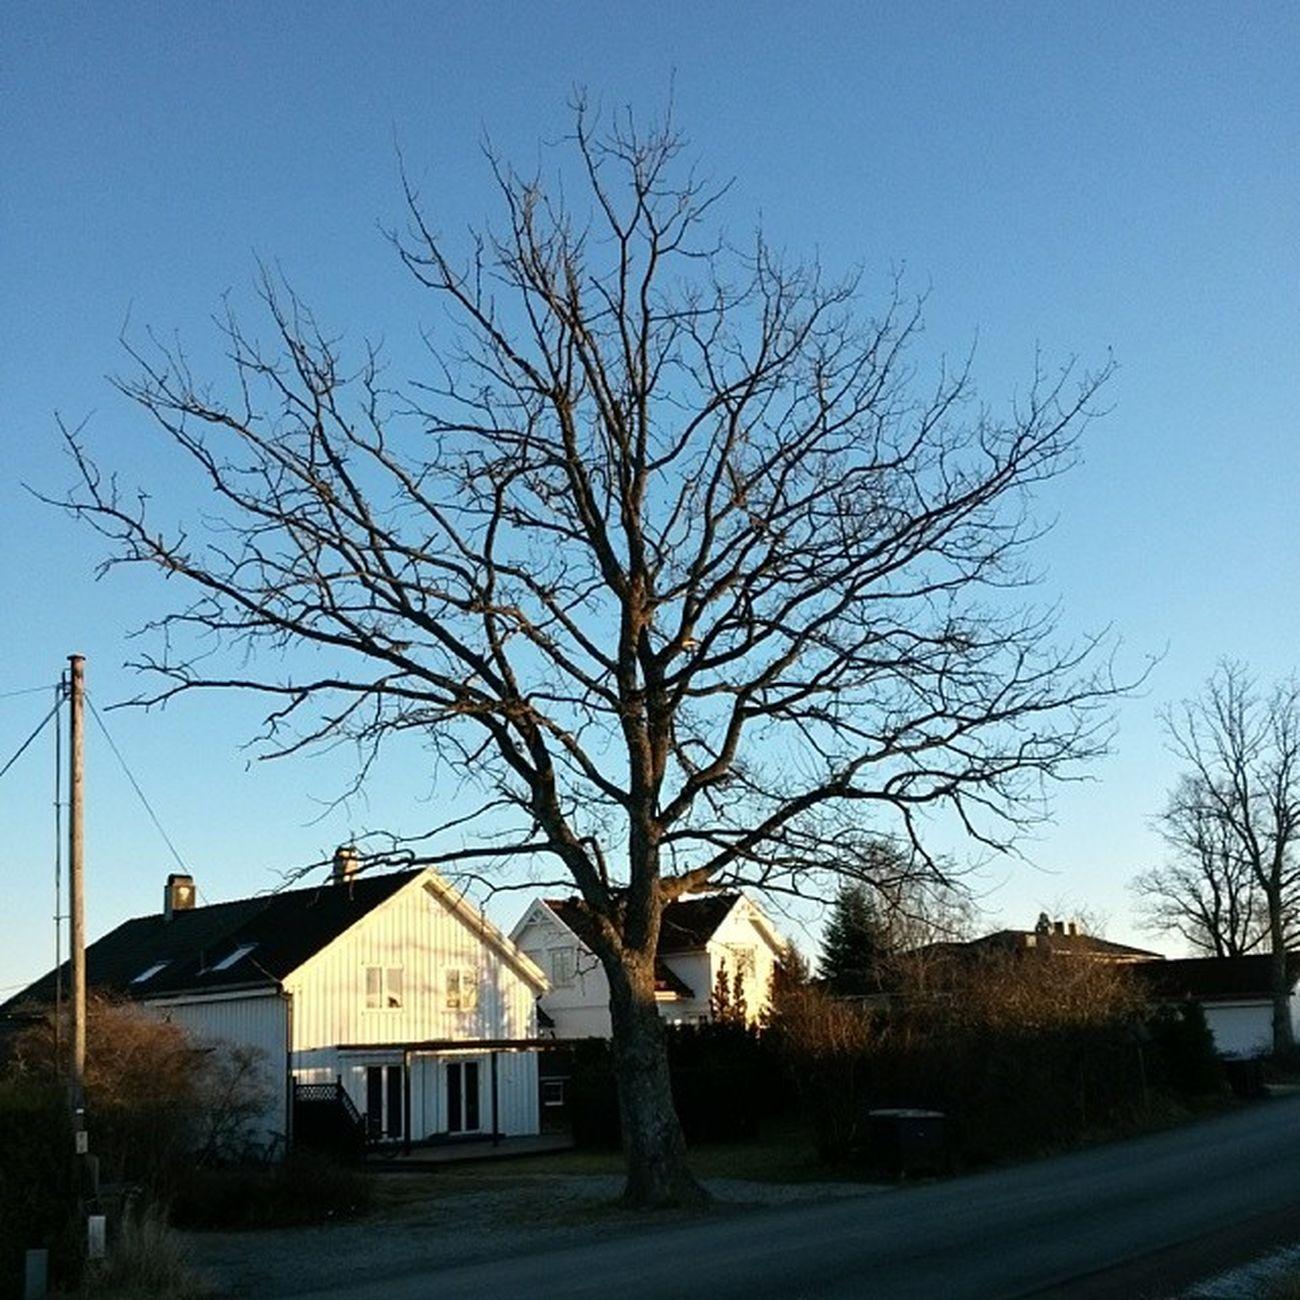 Ilovenorway Ilovenorway_akershus Follo   ås worldunion wu_norway winter sunshine tree tre